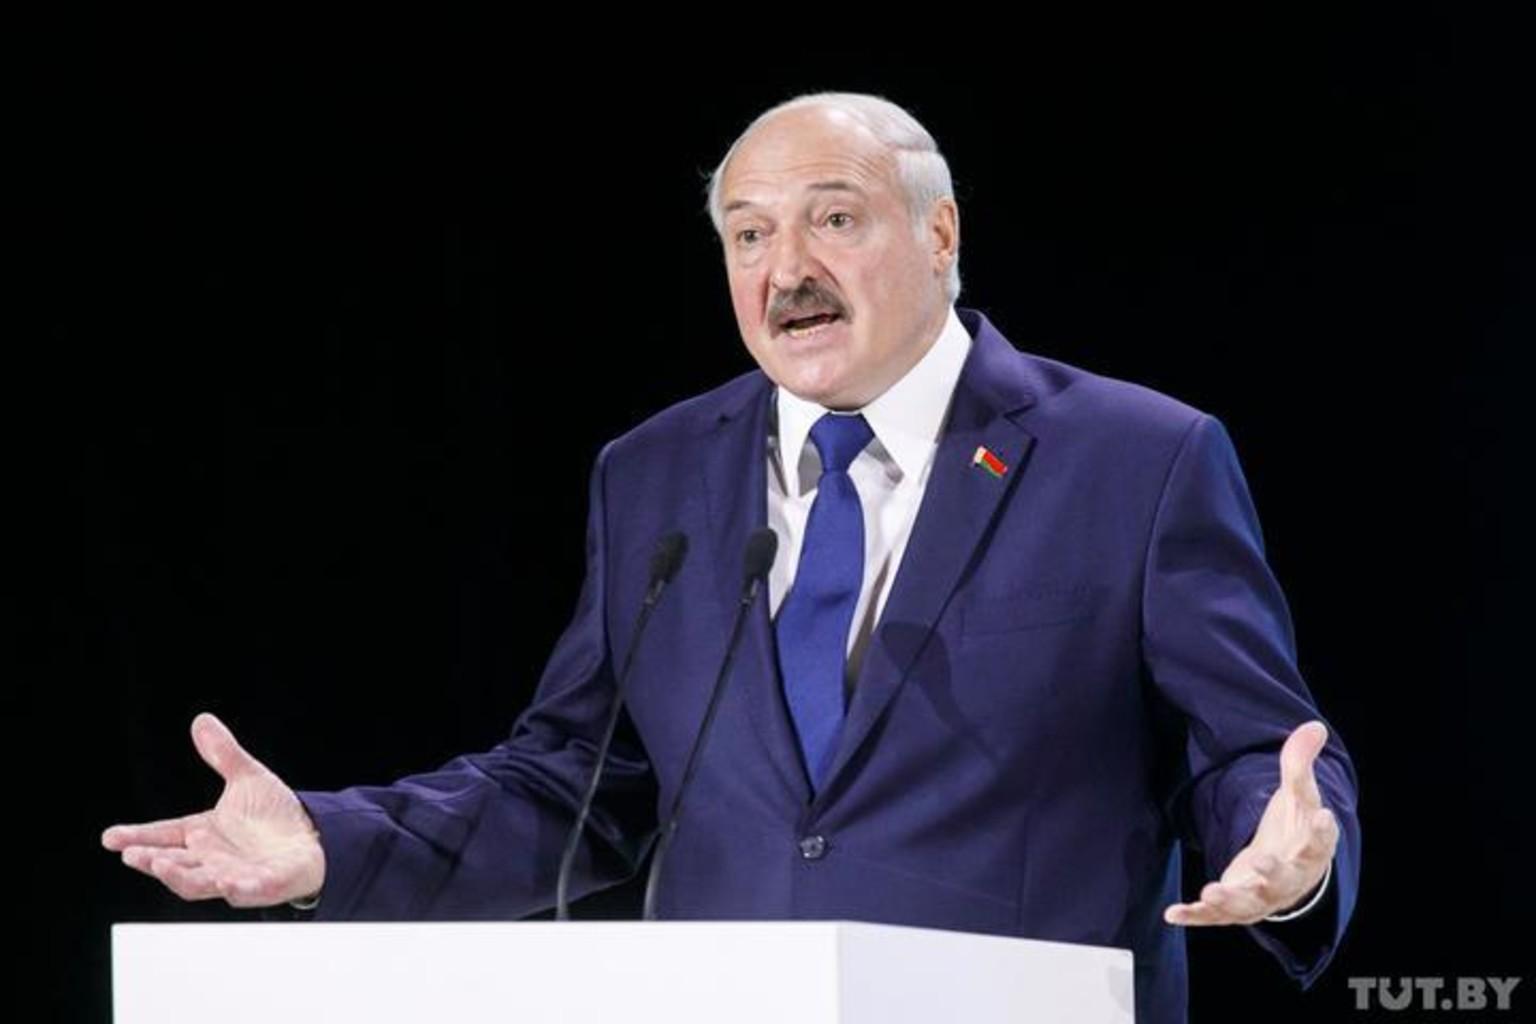 Lukashenko 20191004 shuk tutby phsl 1501